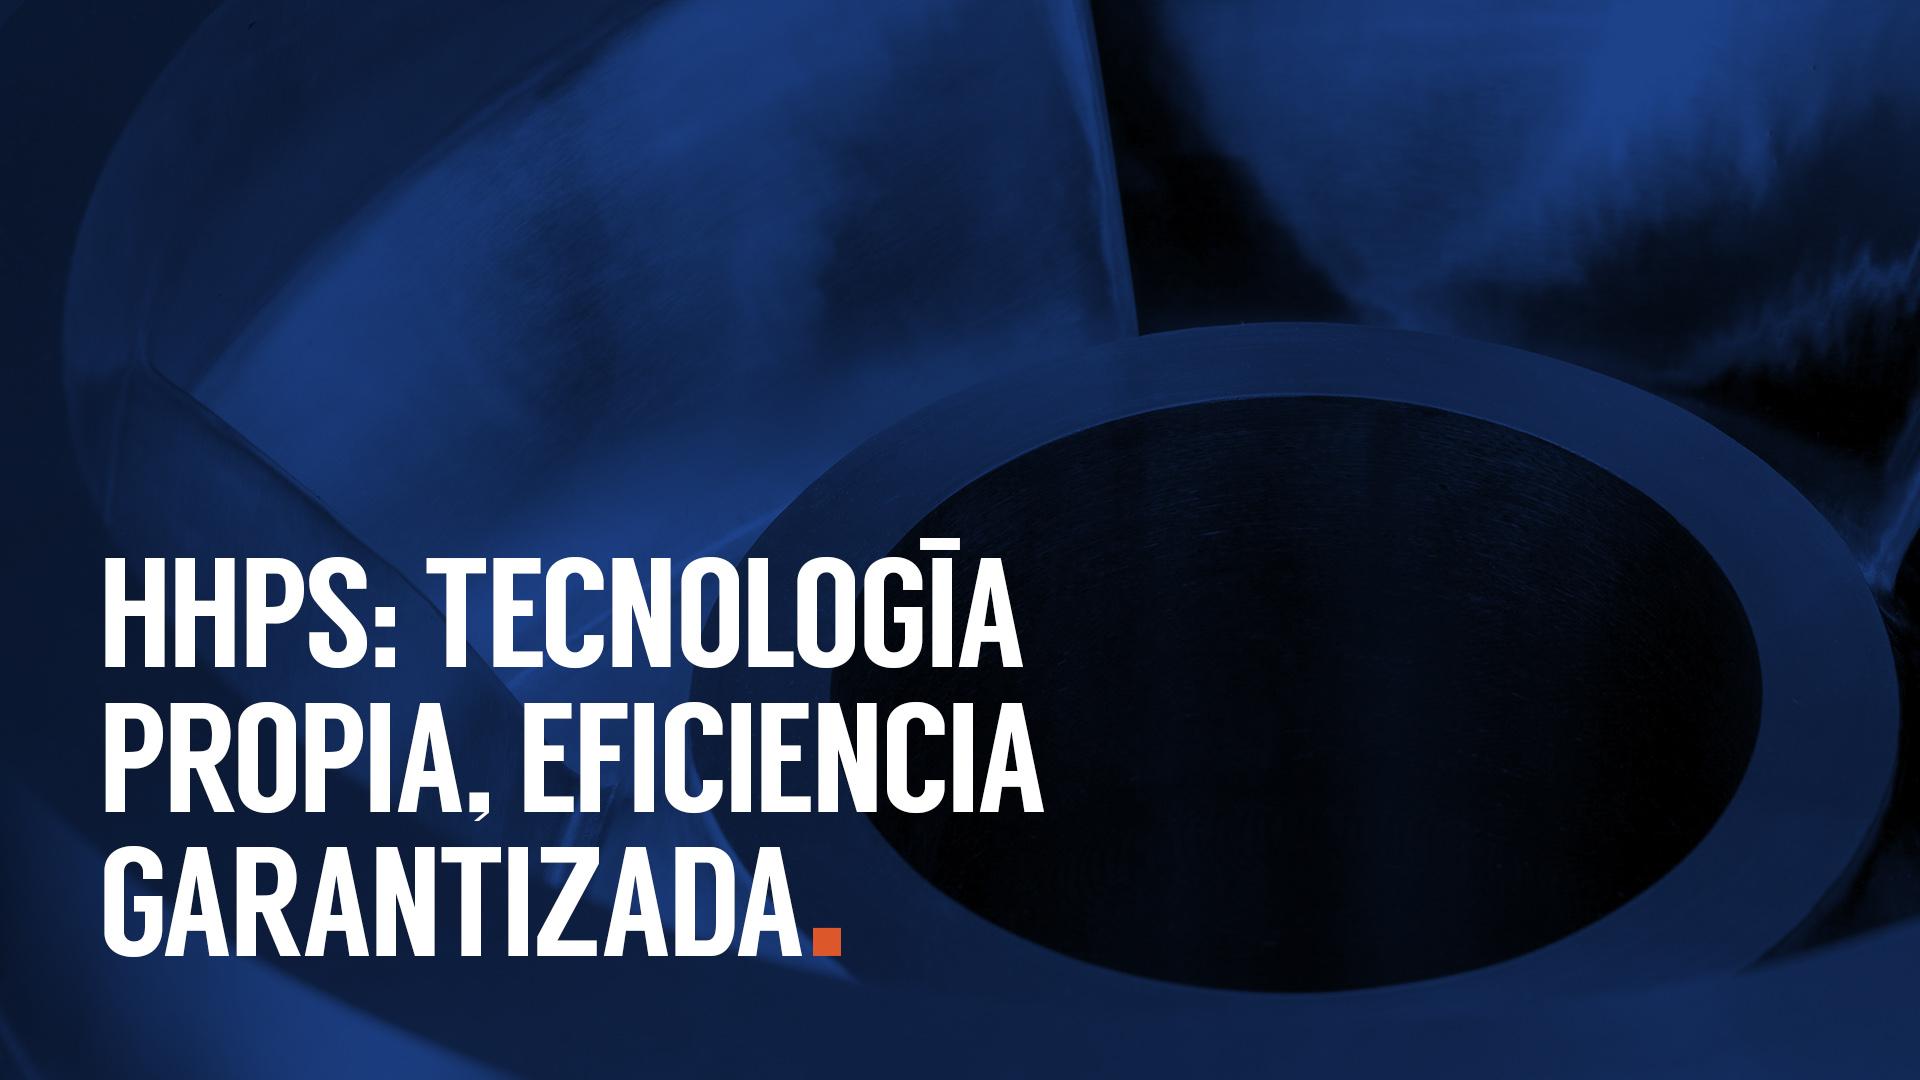 HHPS: Tecnología propia, eficiencia garantizada